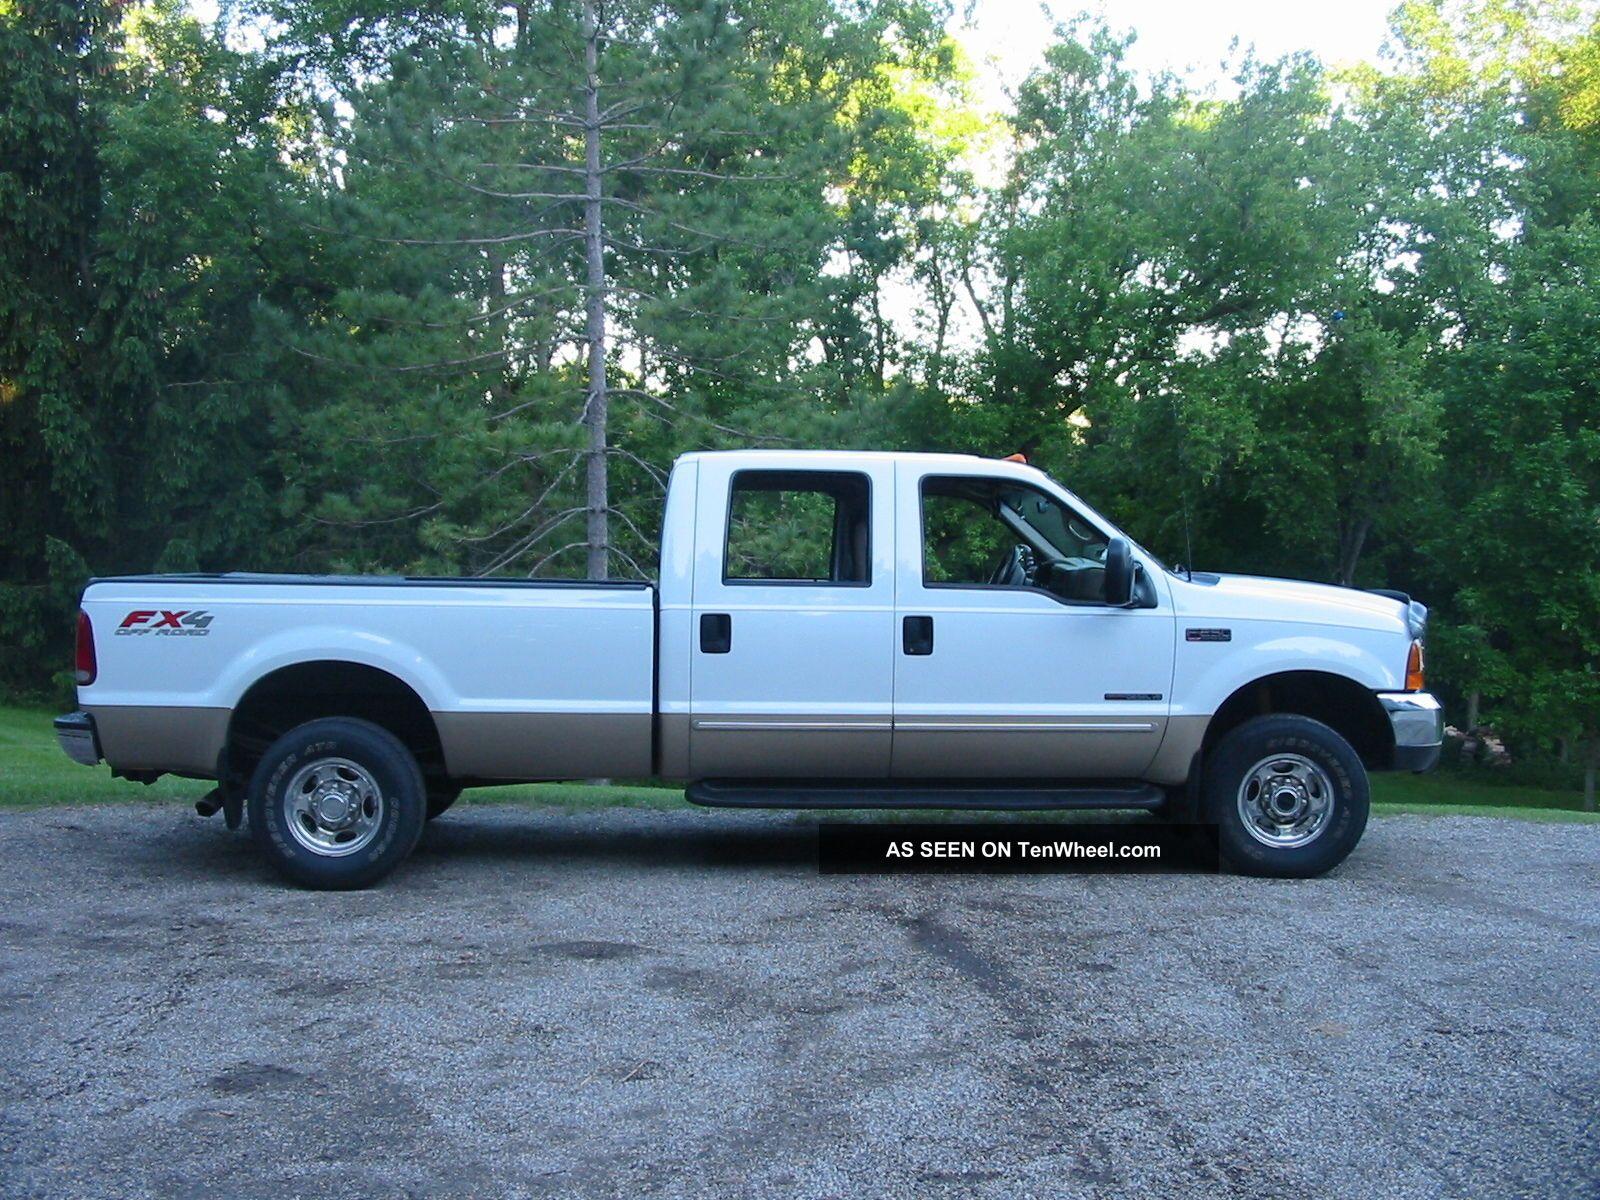 2000 ford f 250 duty lariat crew cab pickup 4 door 7 3l. Black Bedroom Furniture Sets. Home Design Ideas